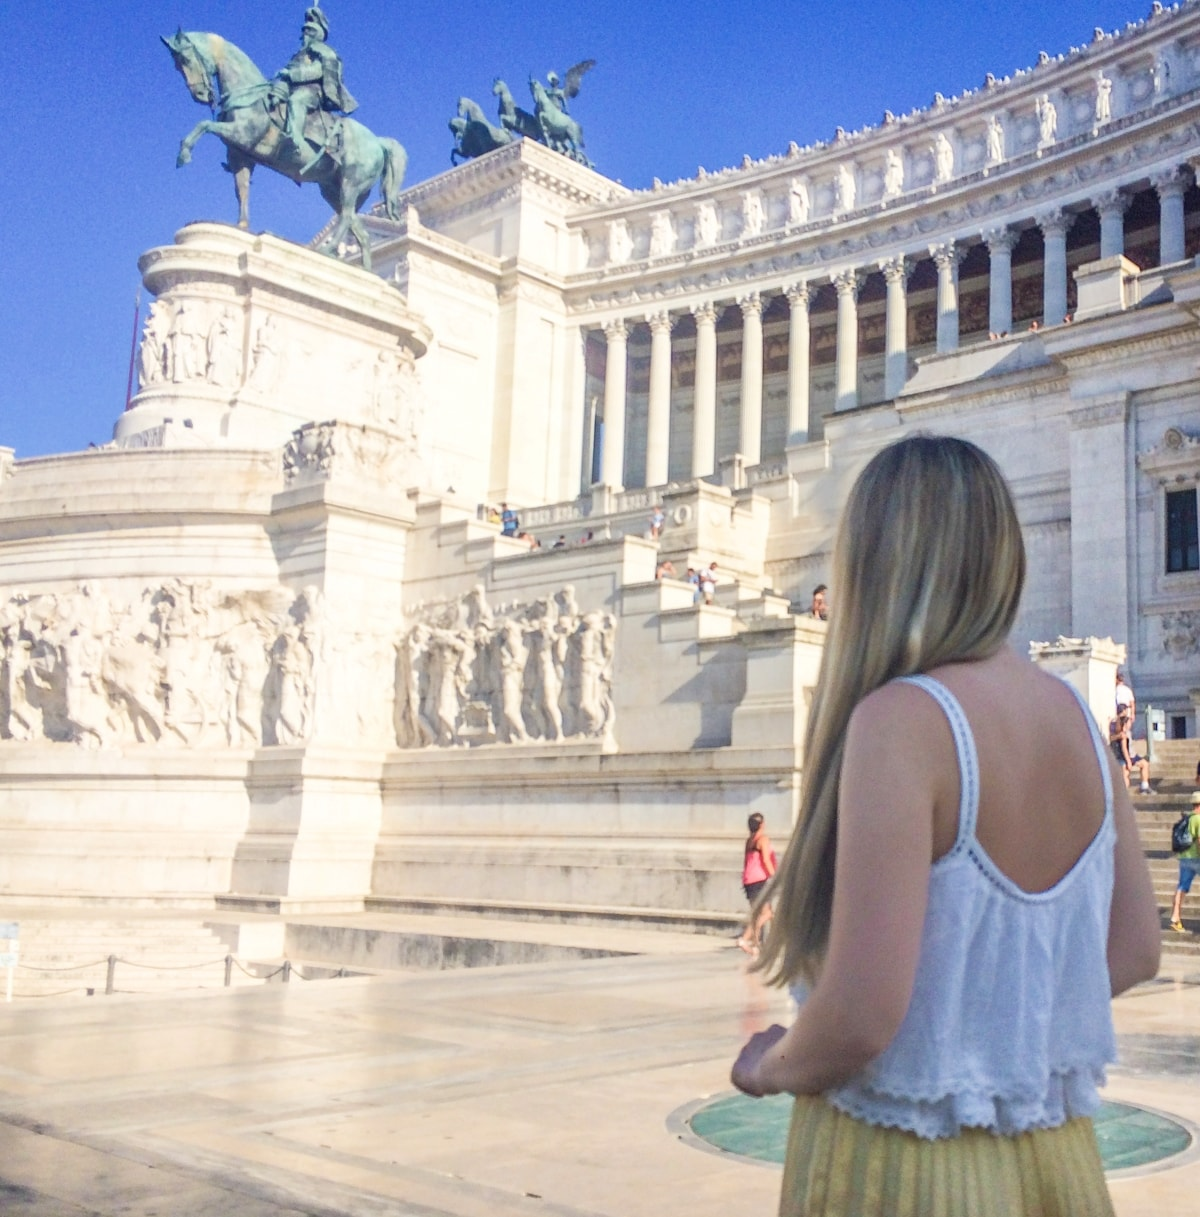 Andreea Ristea, follow me to rome, victor emmanuel II monument